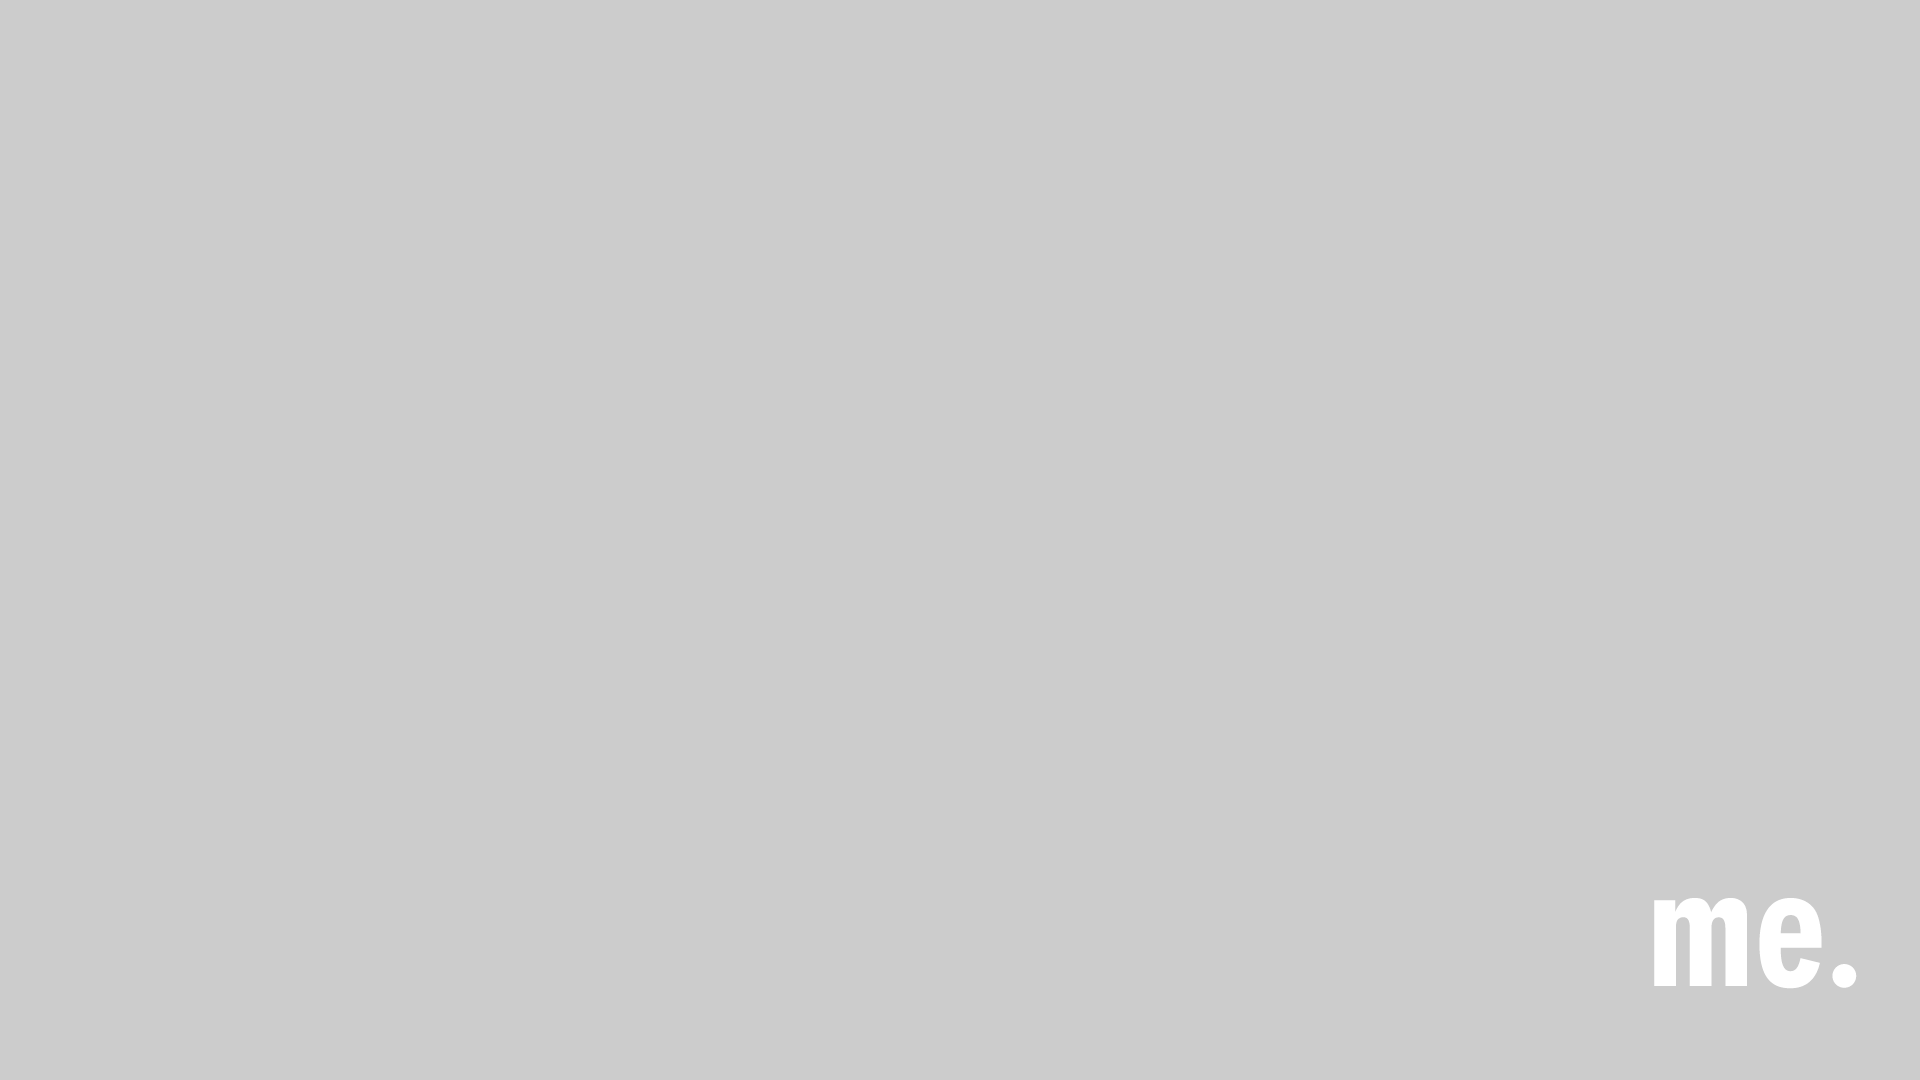 Win Butler mit Arcade Fire a.k.a. The Reflektors live in London am 11. November 2013